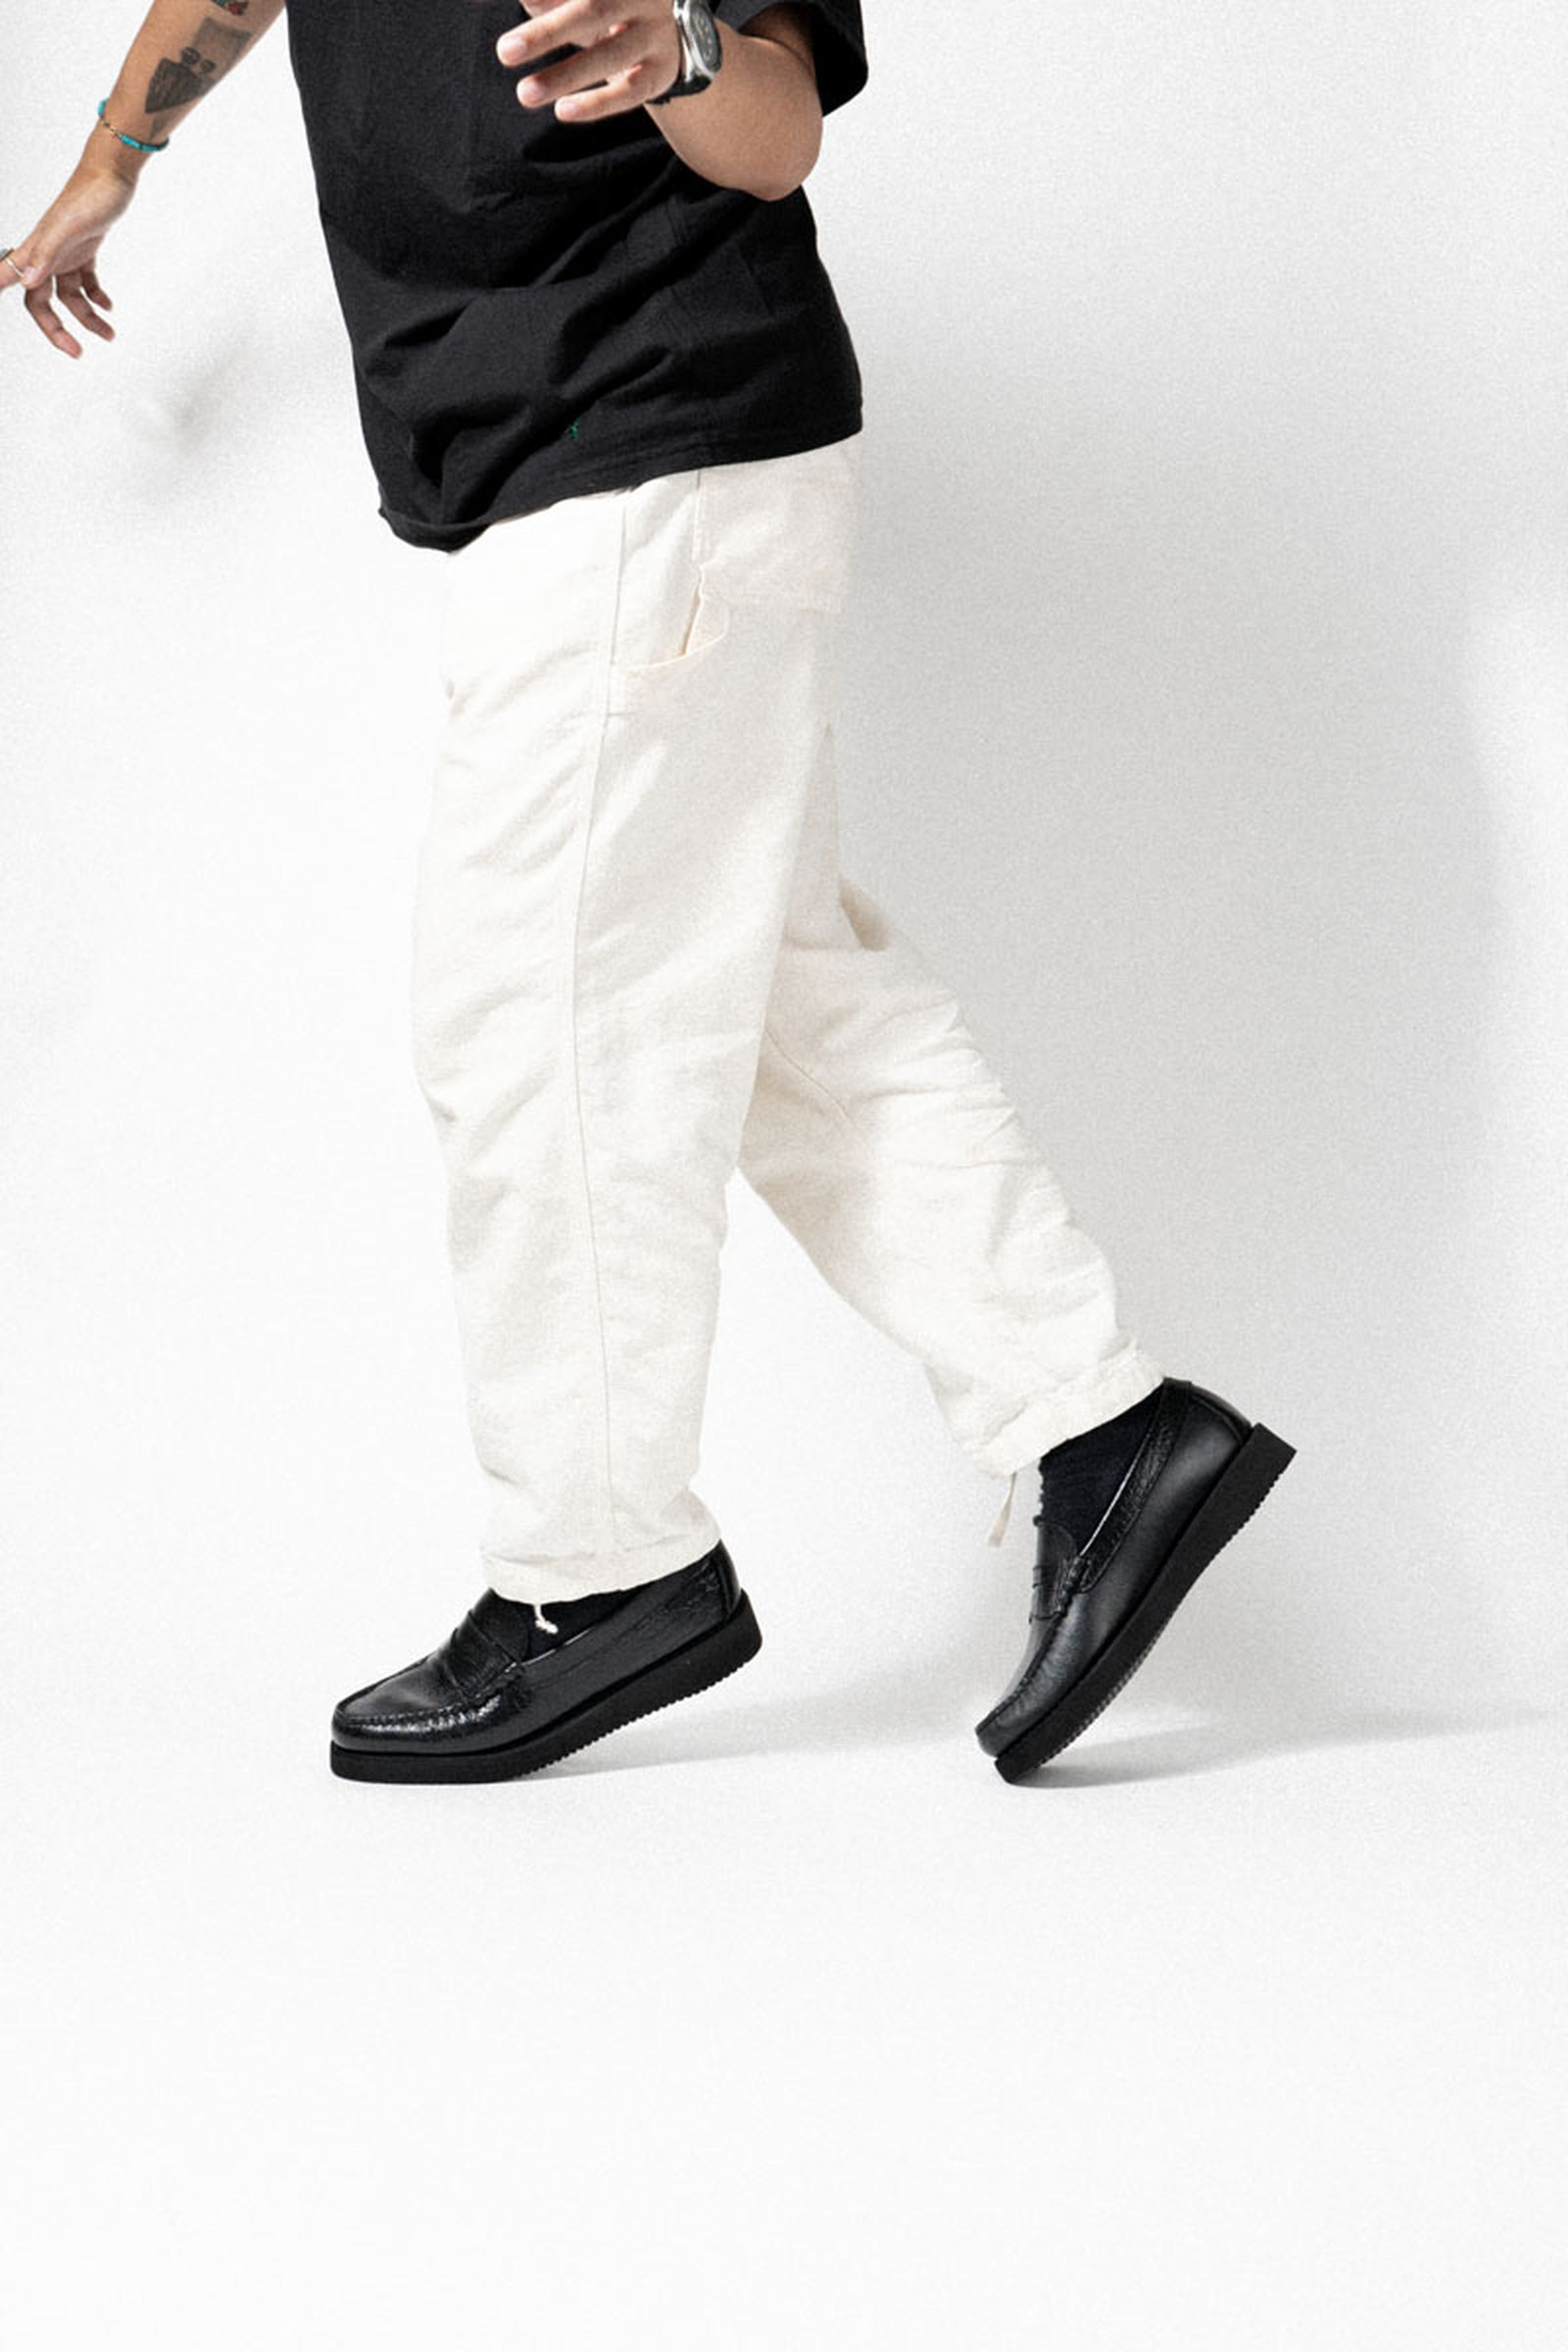 engineered-garments-sebago-fw21-release-info-01